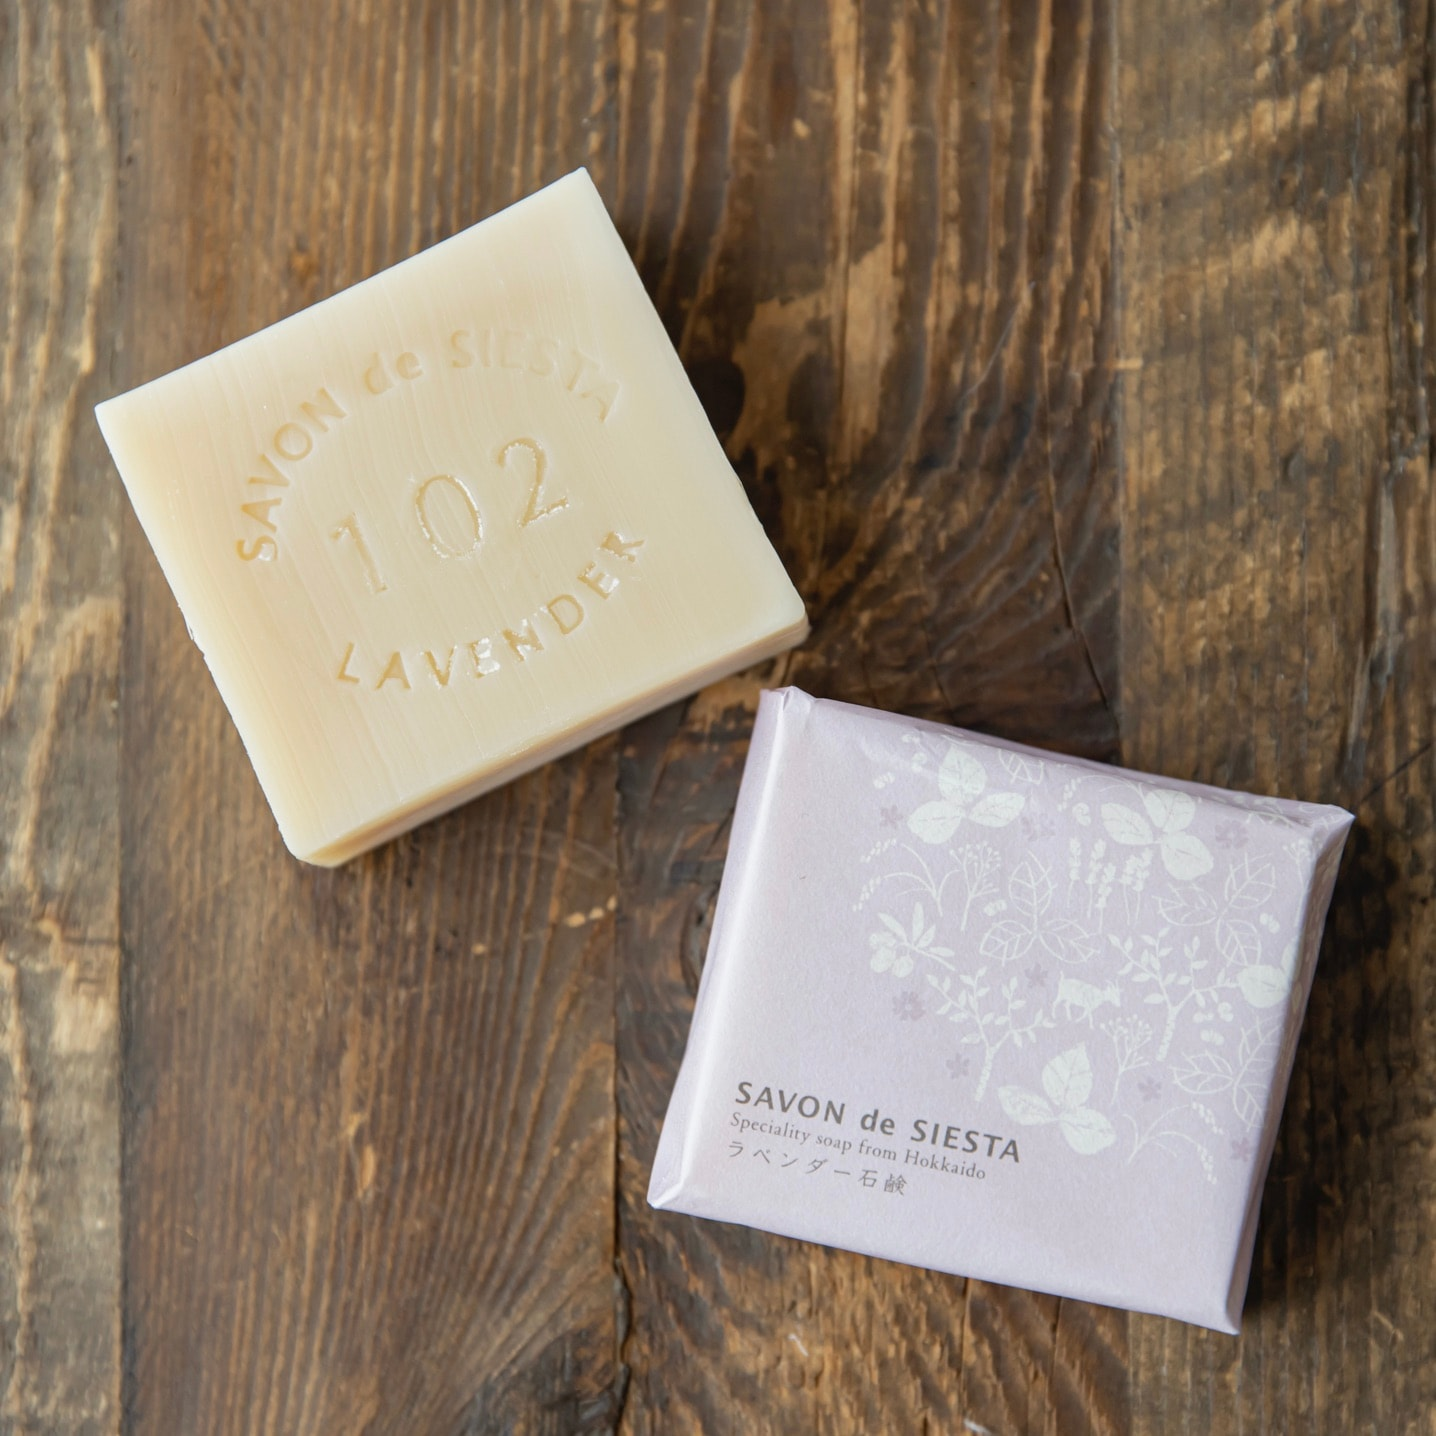 SAVON de SIESTA(サボンデシエスタ)のラベンダー石鹸,洗顔石けん,ハンドソープ,ボディソープ